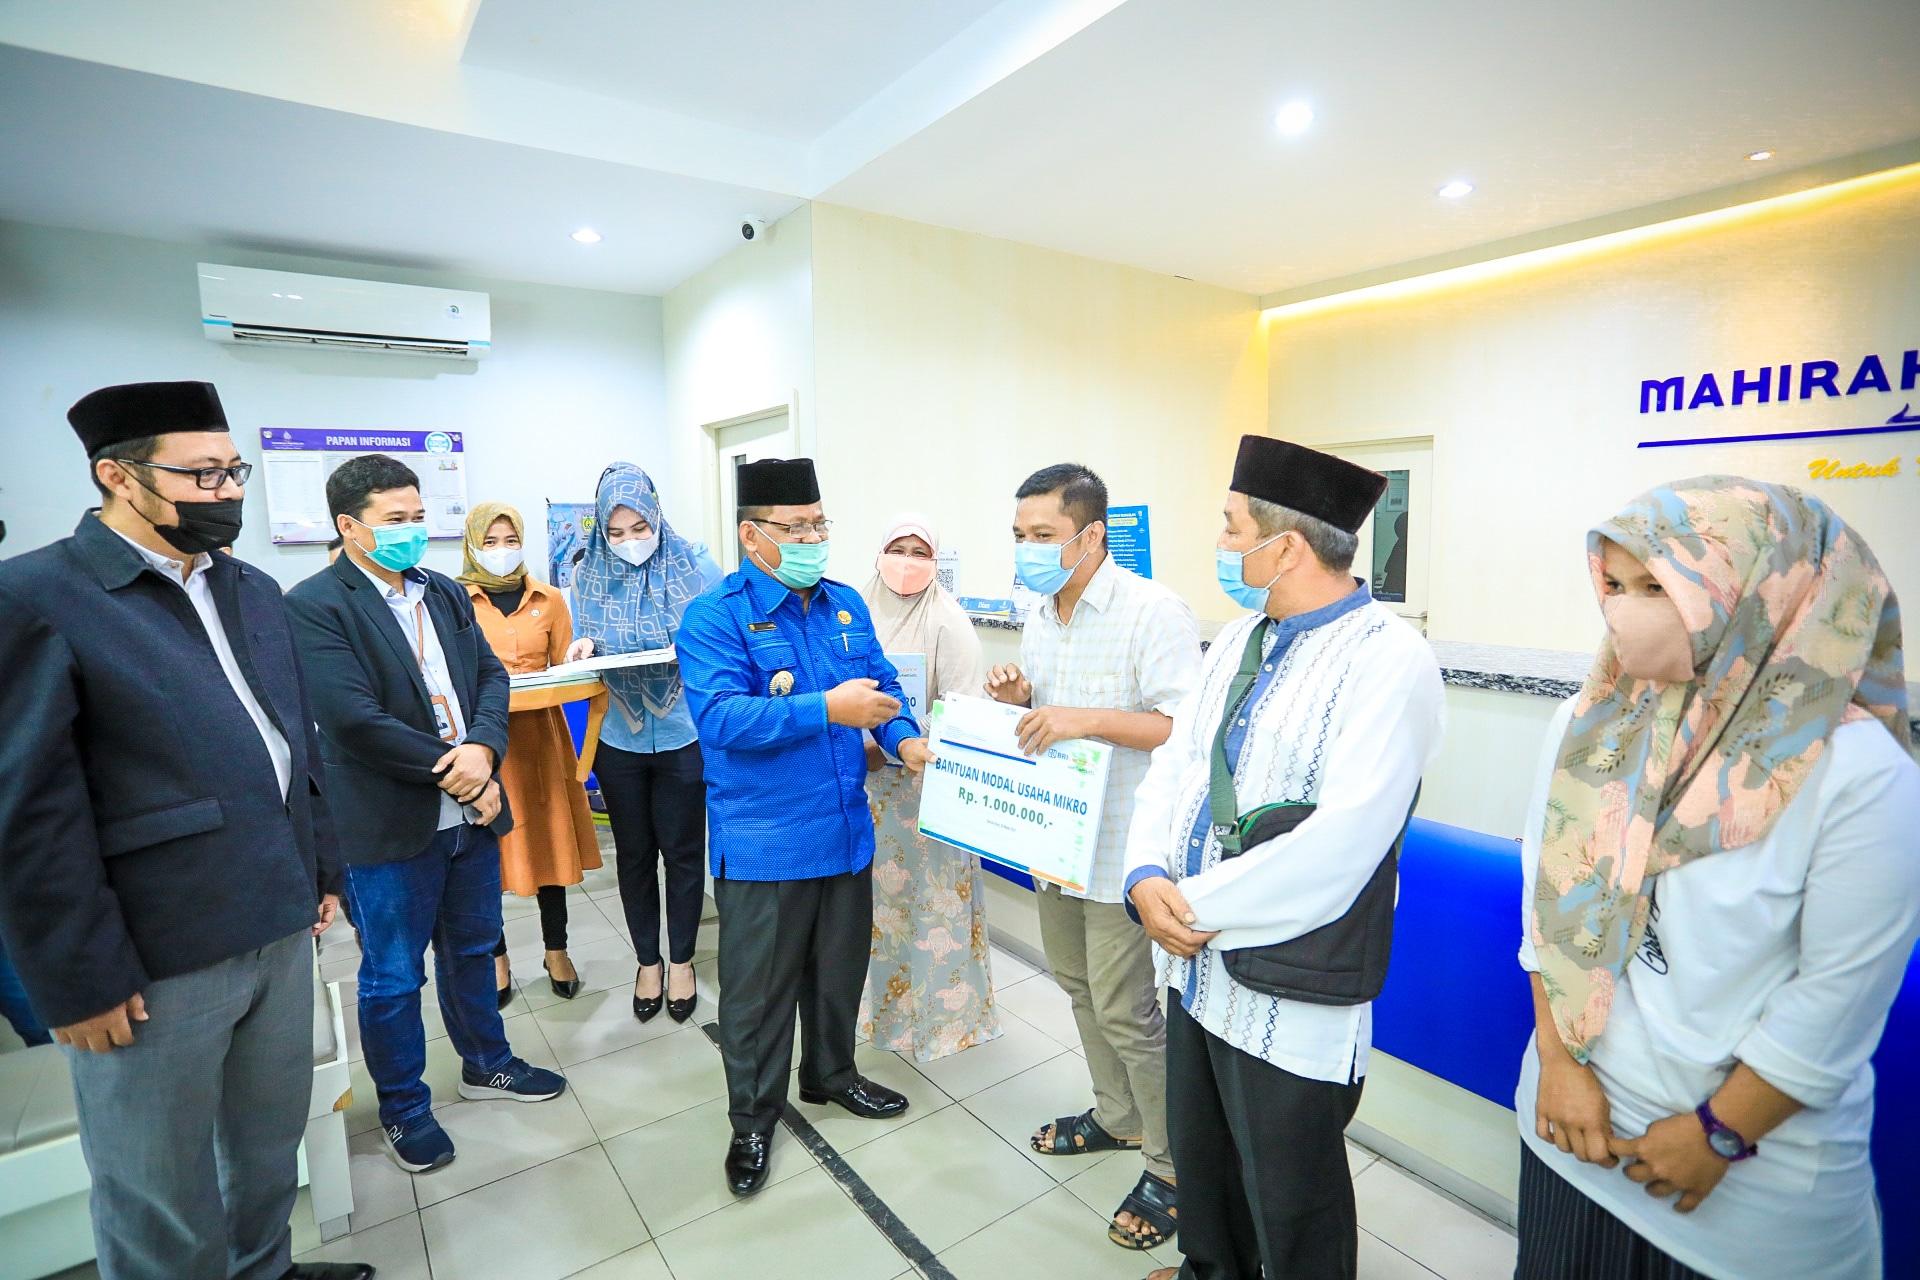 Disaksikan Walikota, BRINS dan LKMS Mahirah Muamalah Banda Aceh Teken Kerjasama, 100 Nasabah Langsung dijagain!